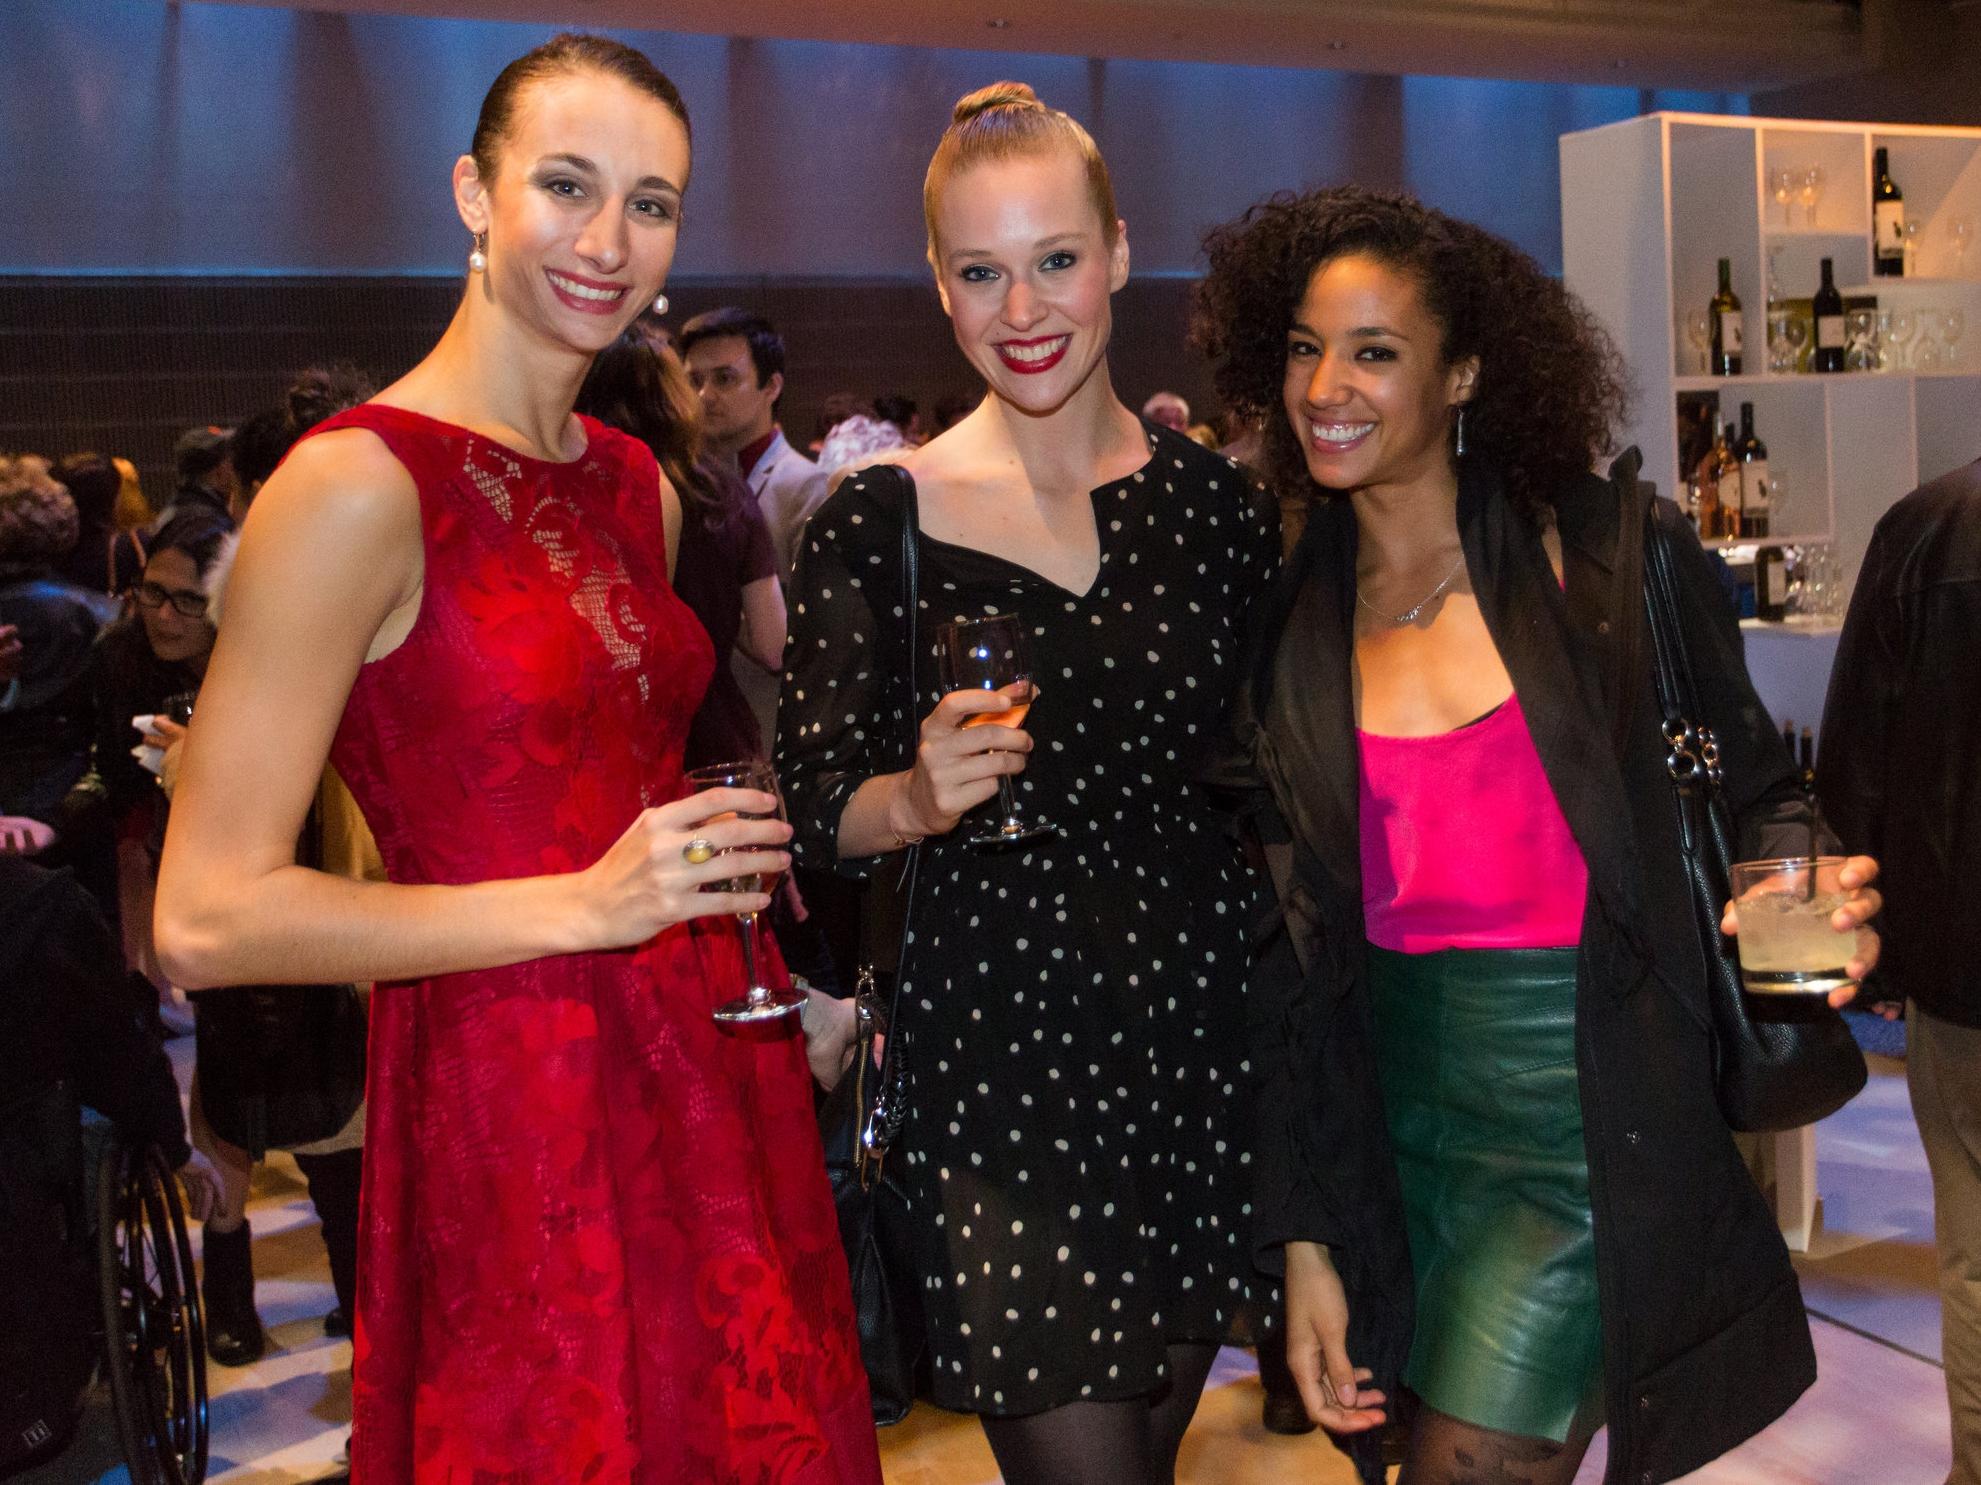 Ilaria Guerra, Jordan Drew, and Kimberly Olivier. photo: Alex Reneff-Olson